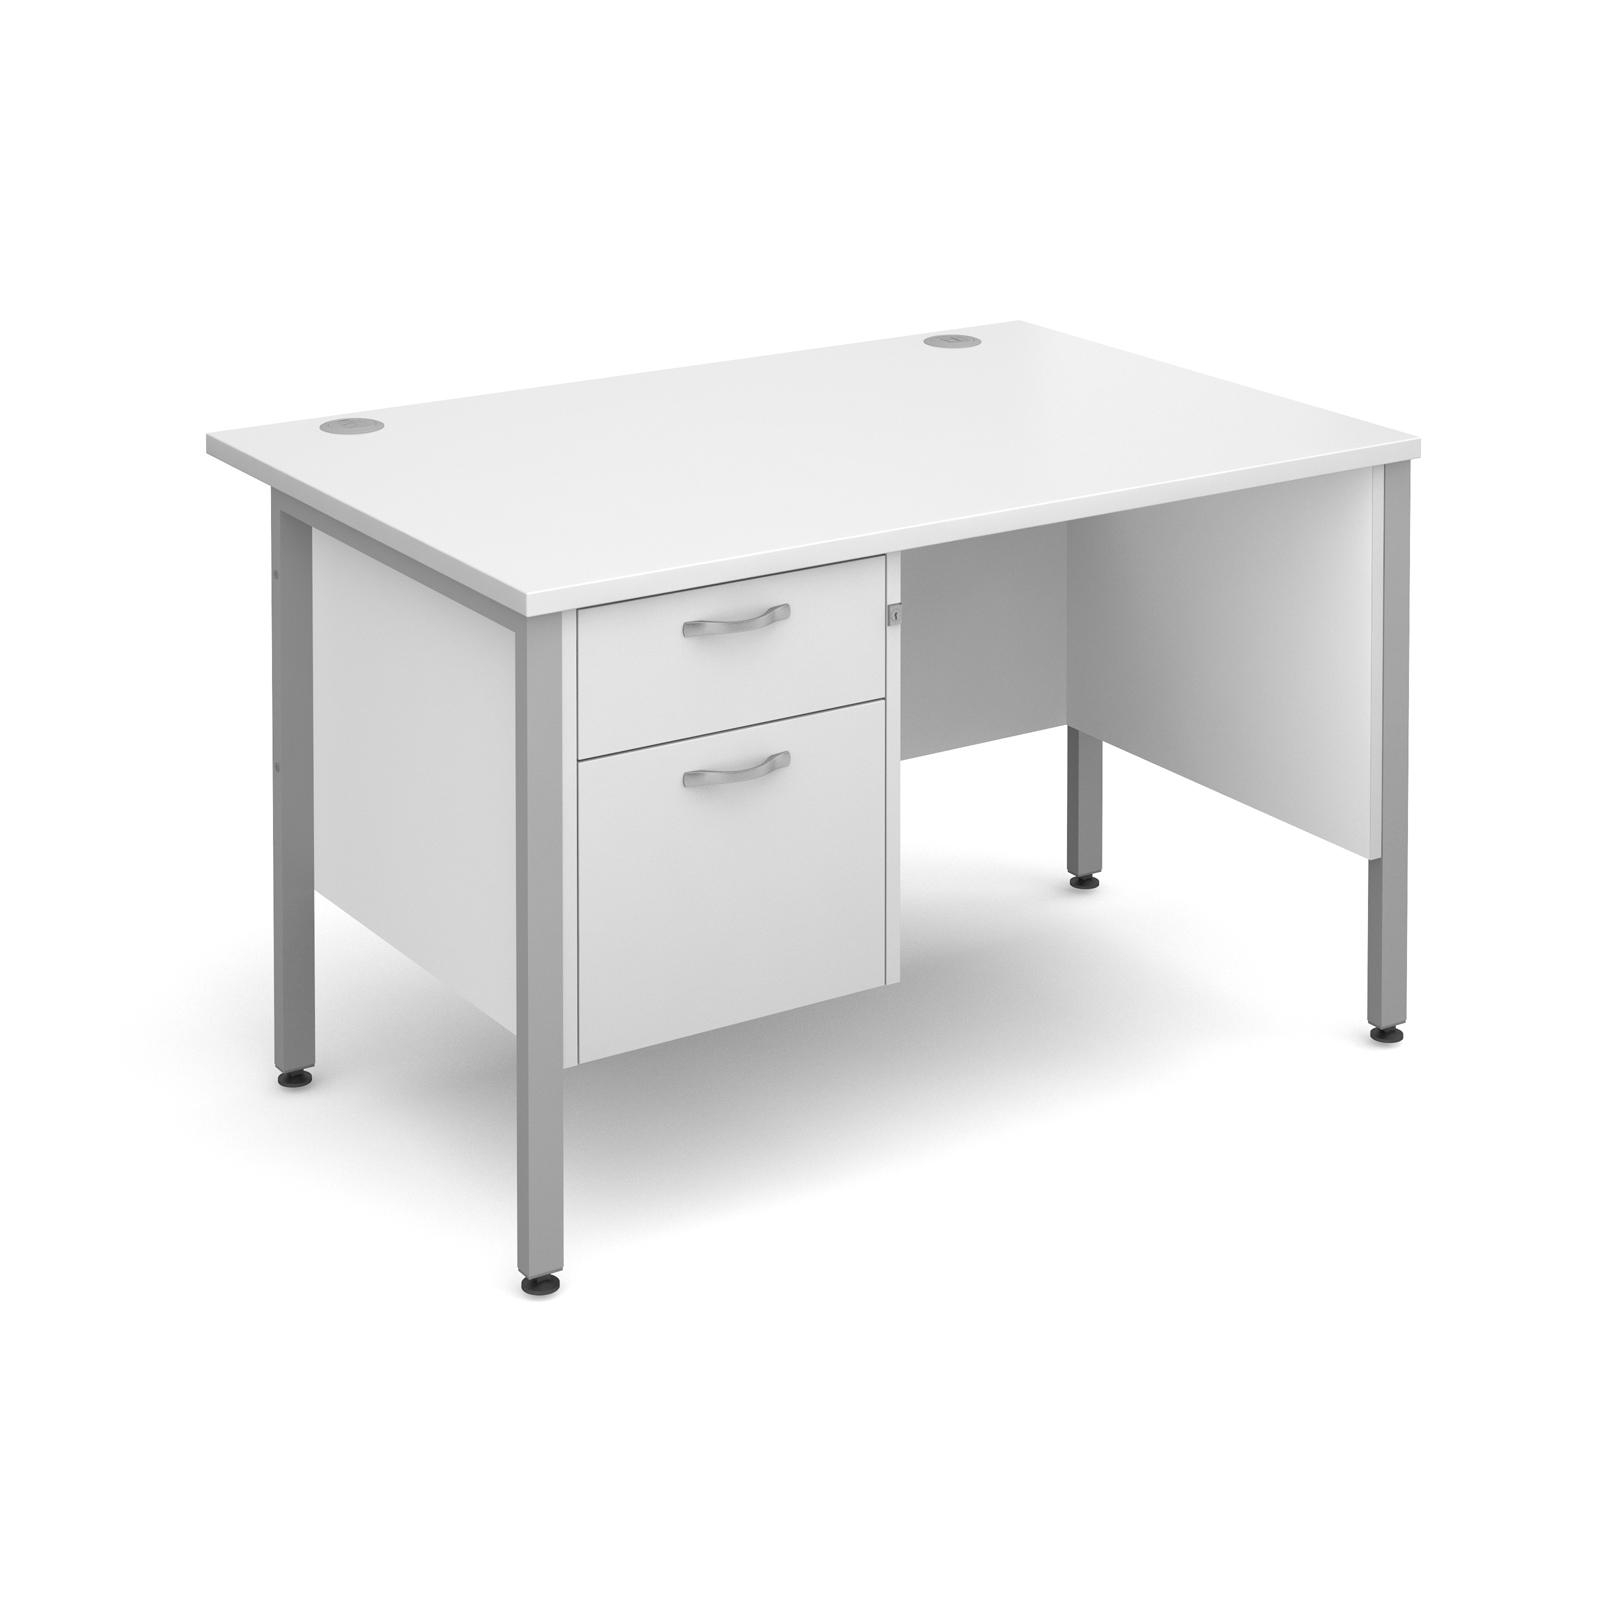 Active M25 SHL Straight Desk   Single Pedestal